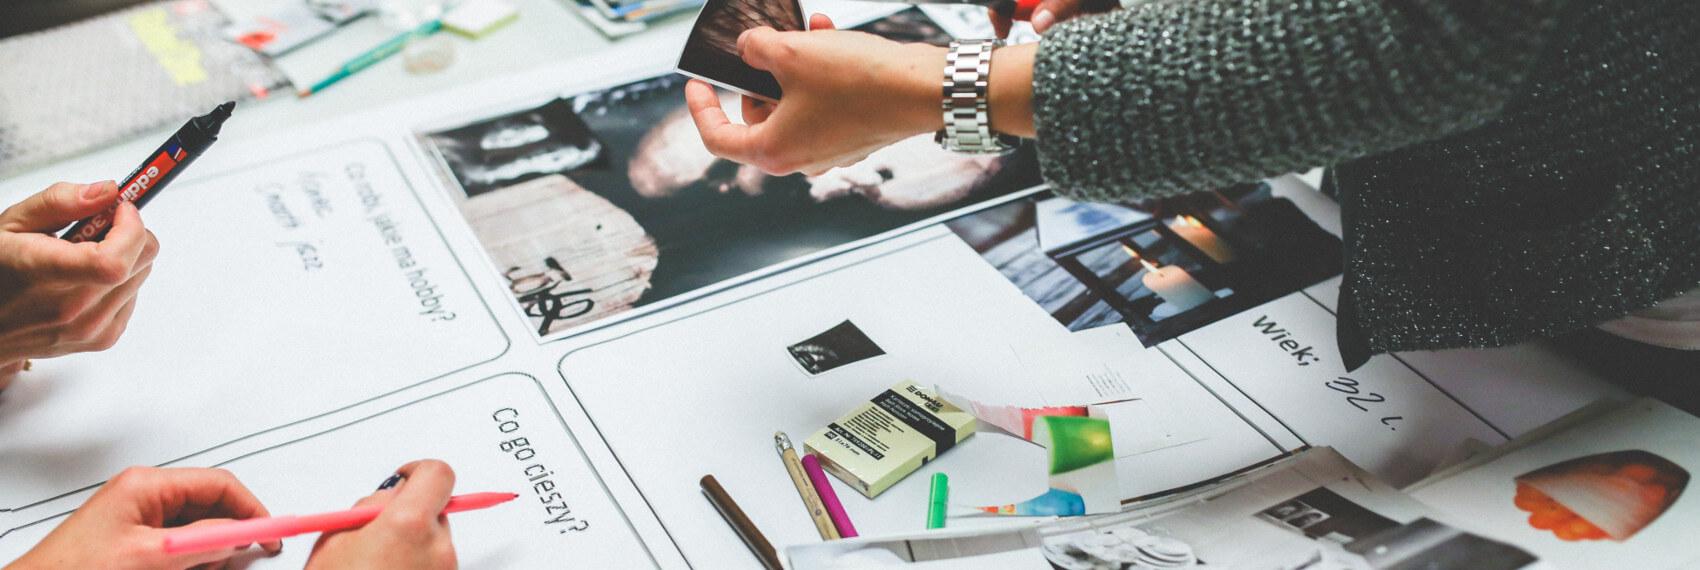 Mopinion: Humanising marketing - with Data Management Platforms - creative marketer